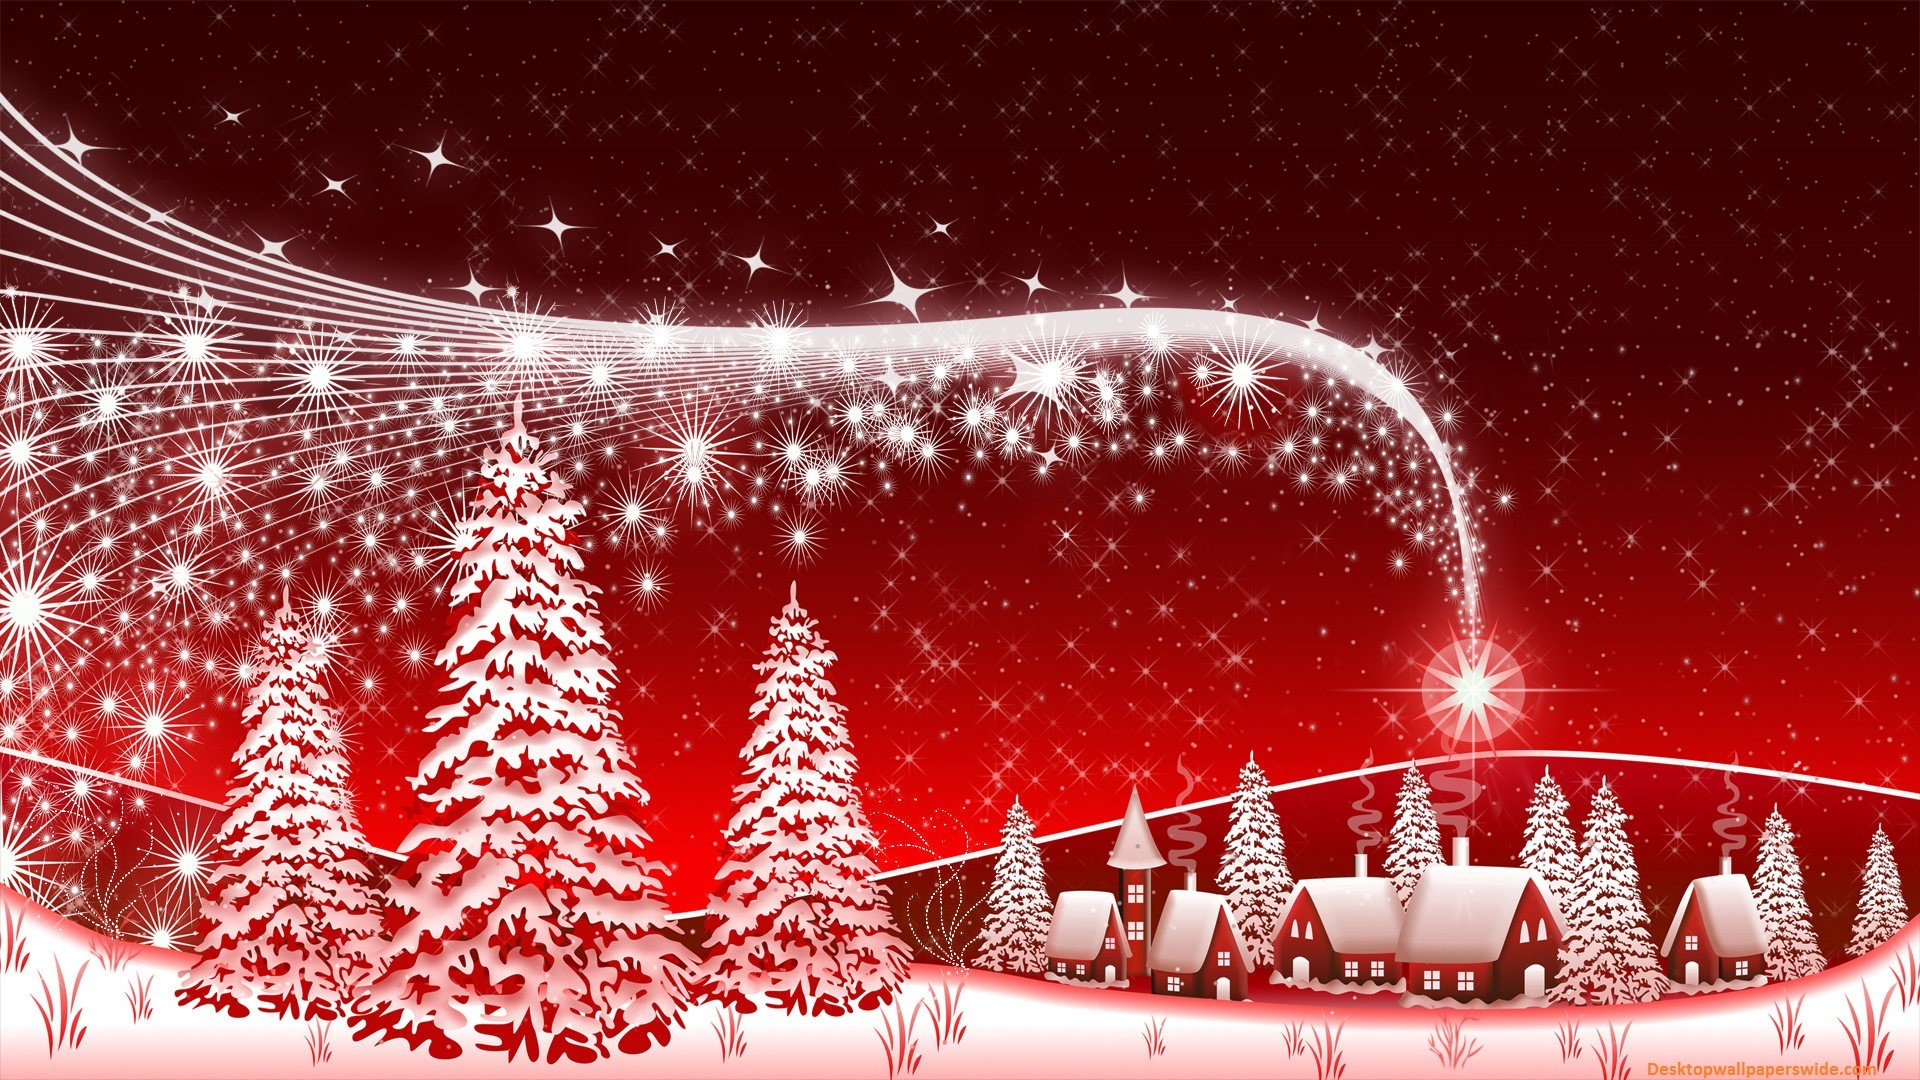 Christmas Wallpapers Hd | Free Christmas Hd Wallpapers | Widescreen .